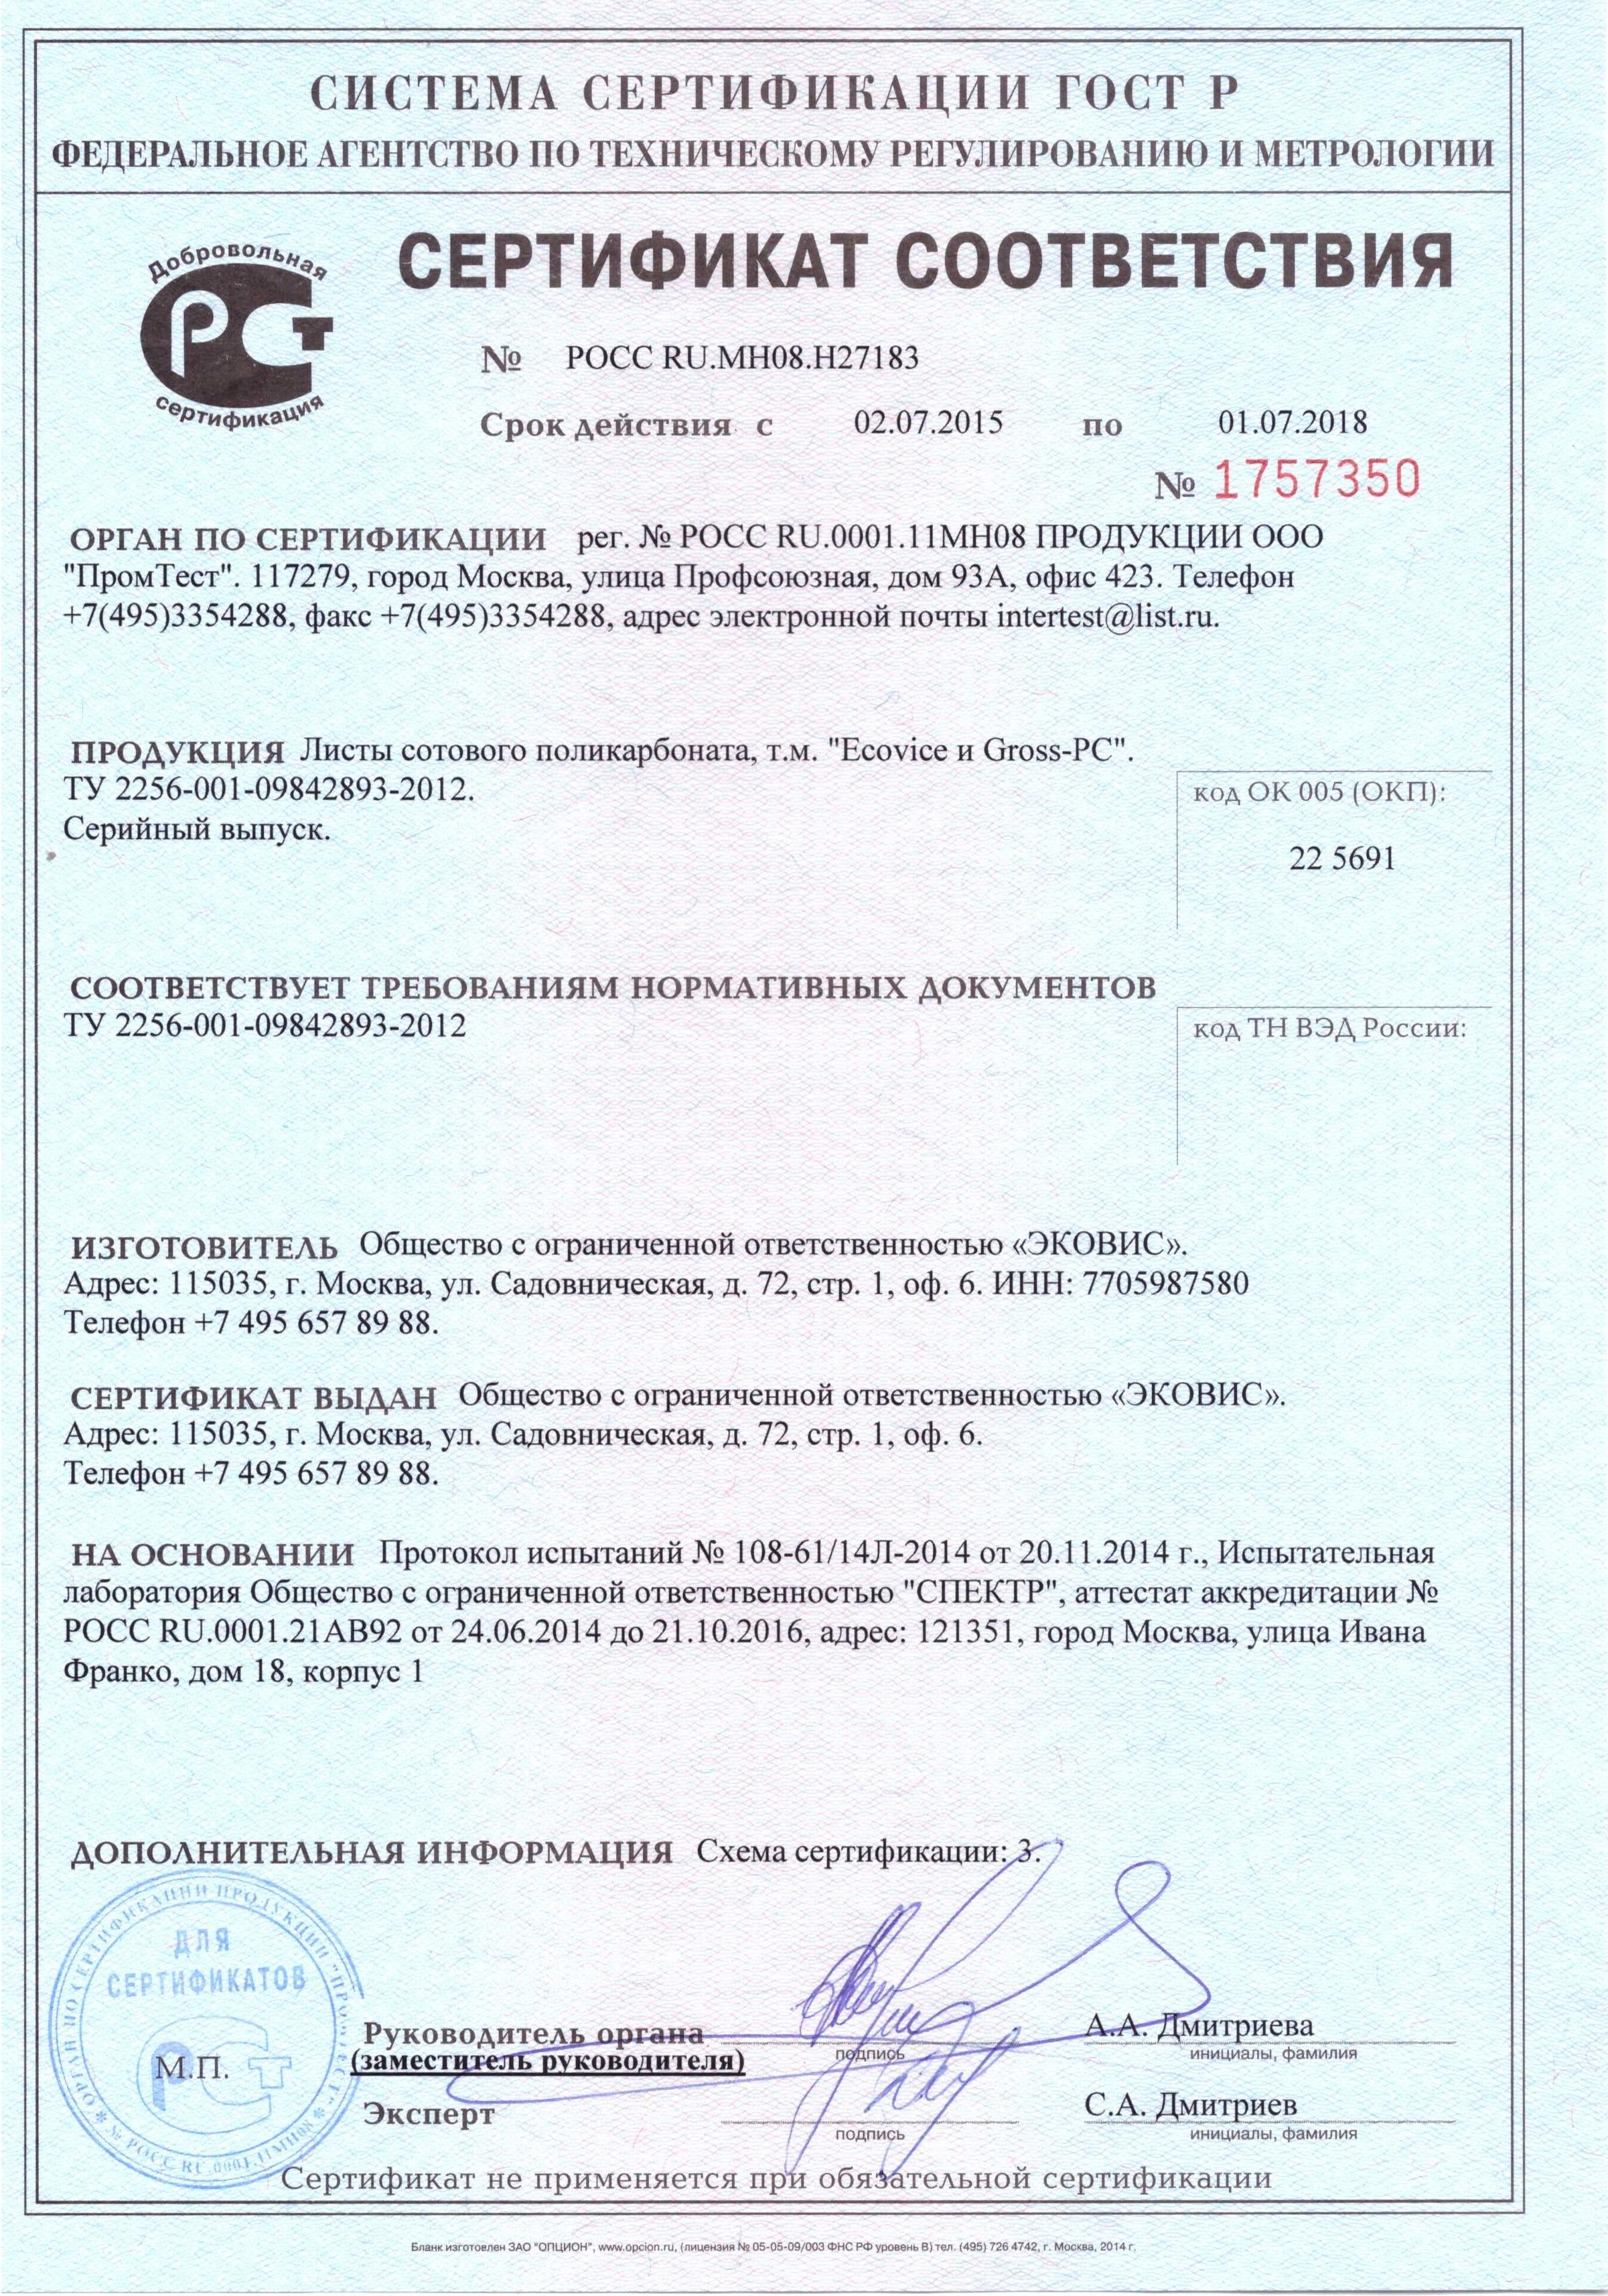 http://ecopoli.ru/images/upload/Сертефикат-соответствия.jpg